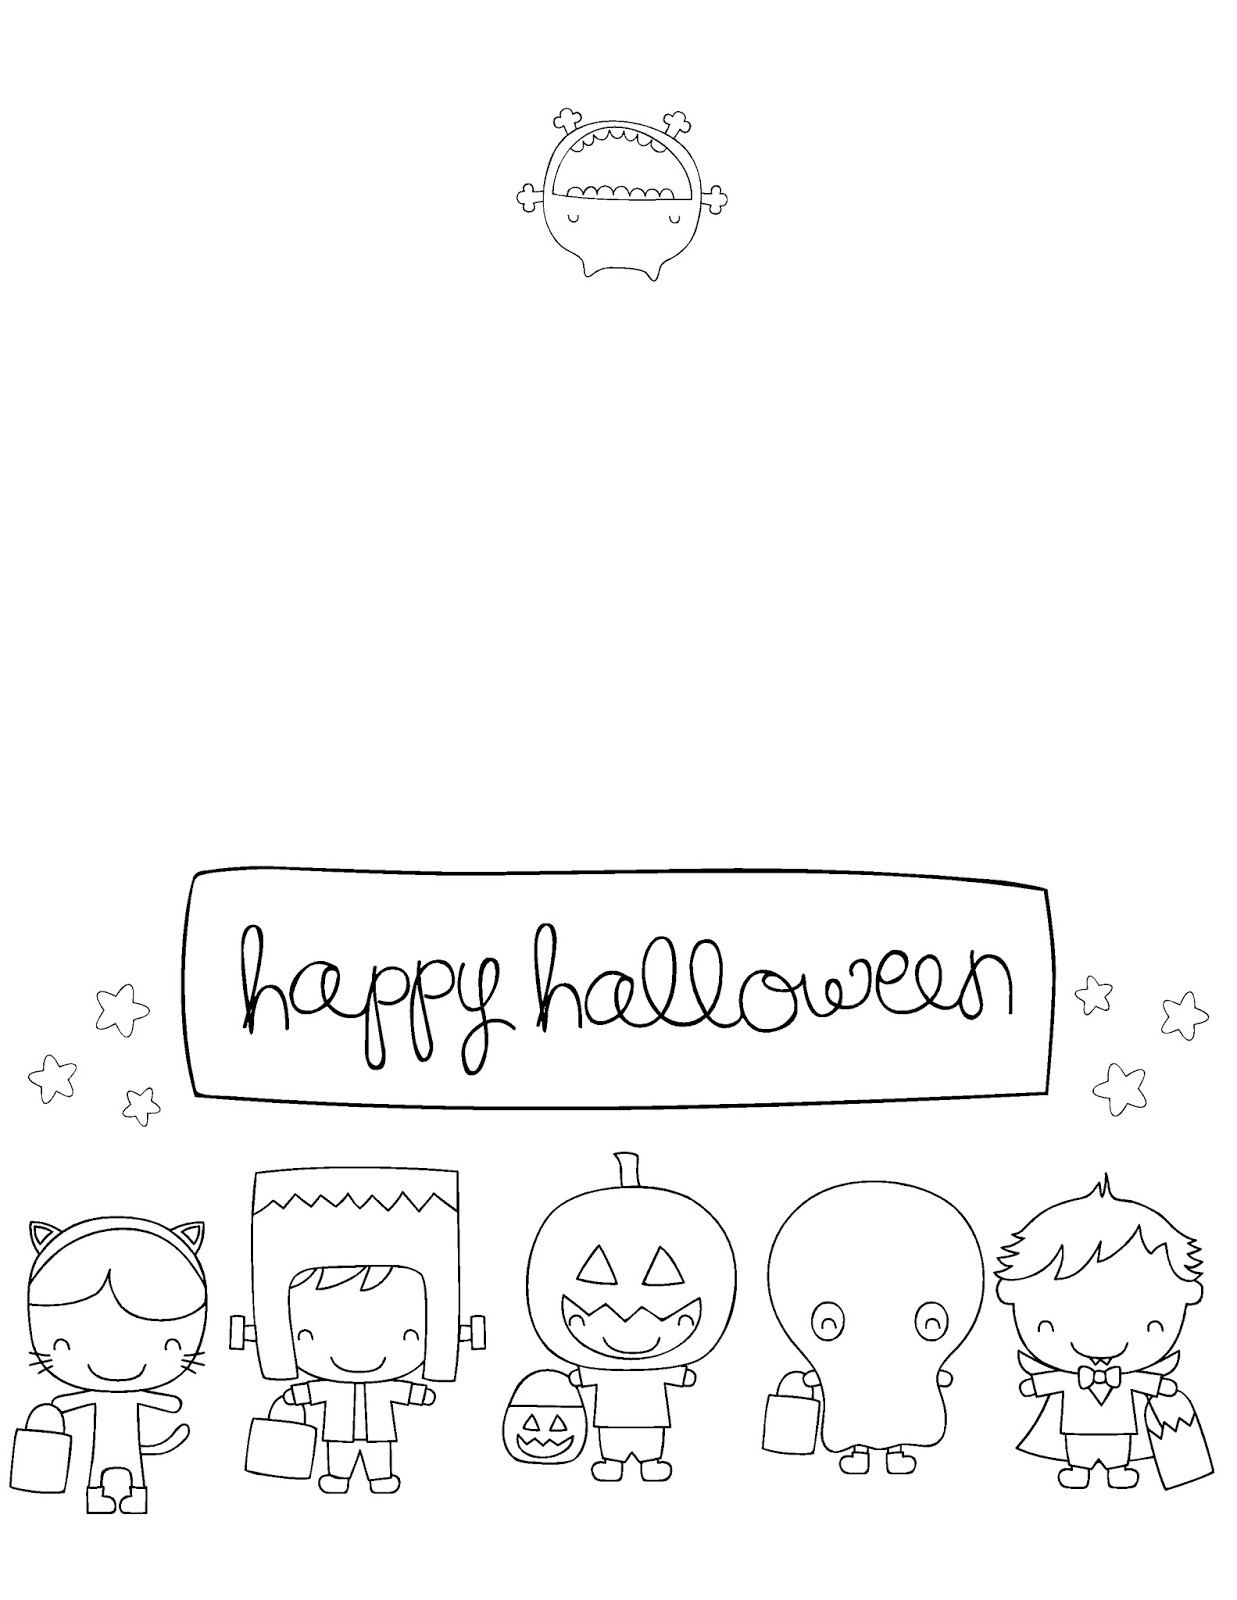 Printable Halloween Cards To Color - Acmsfsu - Printable Halloween Cards To Color For Free